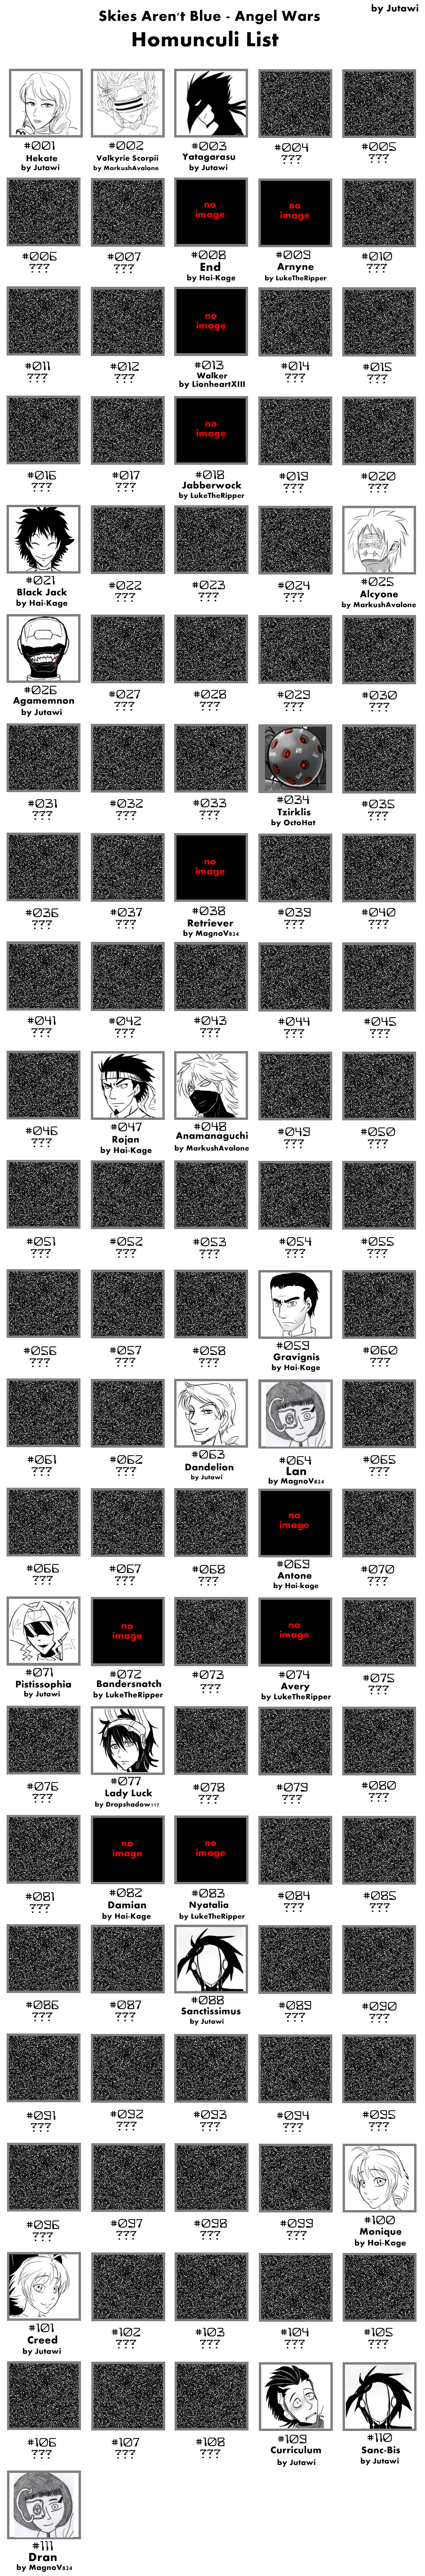 SAB-AW: Homunculi list [updated] by jutawi